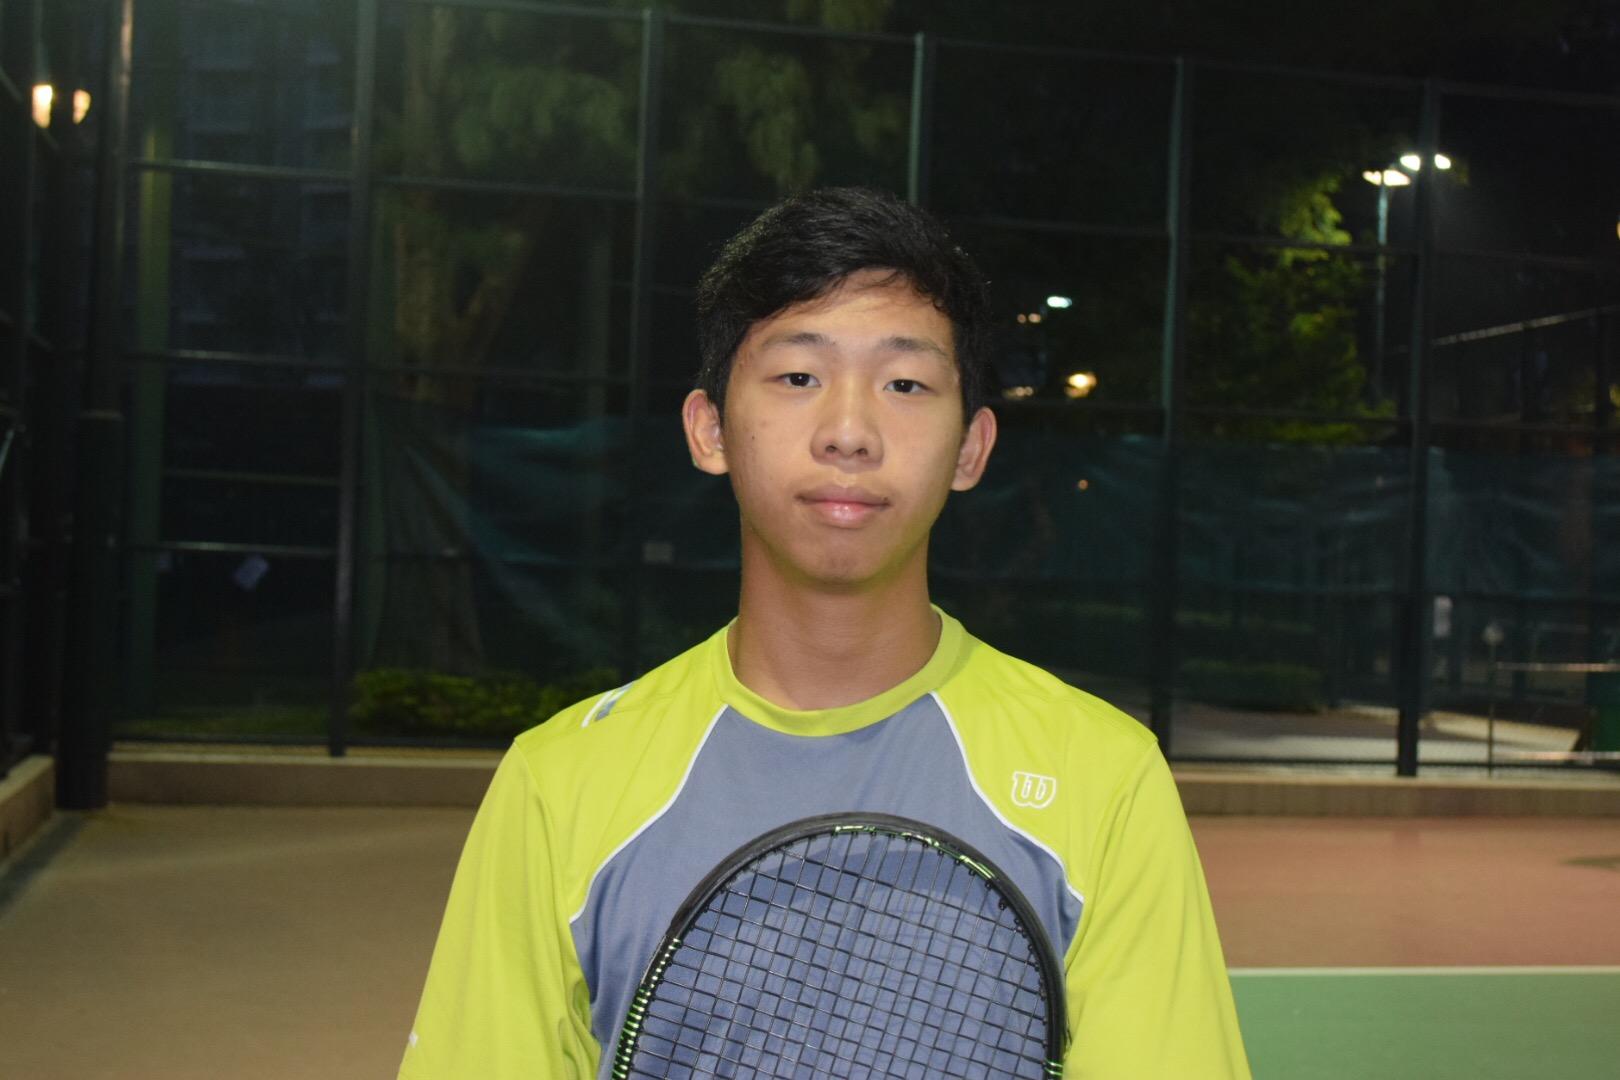 Bryan Fung